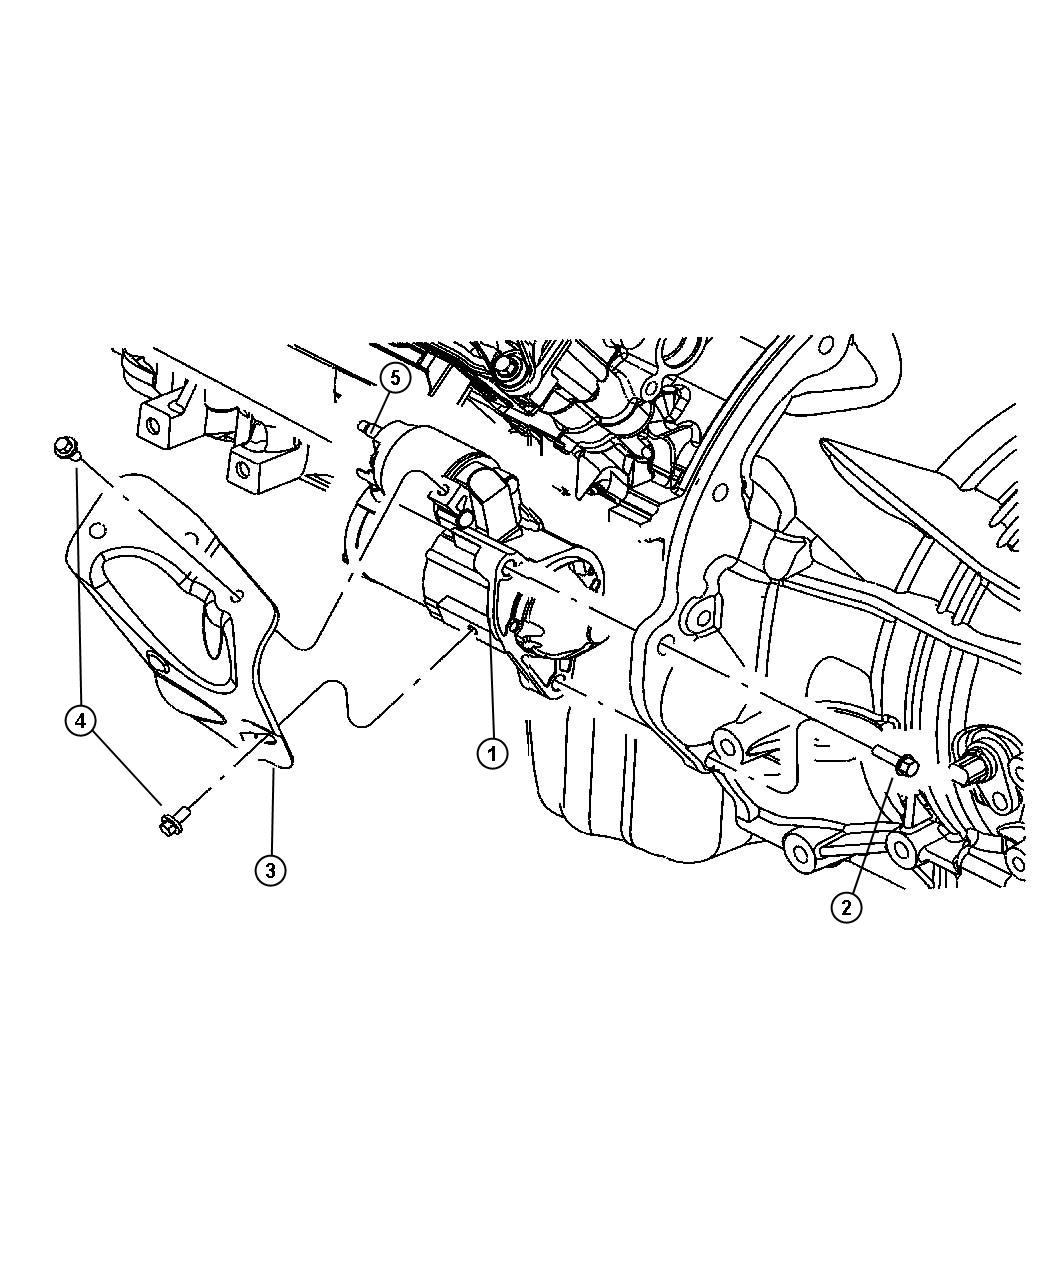 Jeep Grand Cherokee Starter Engine Maintenance